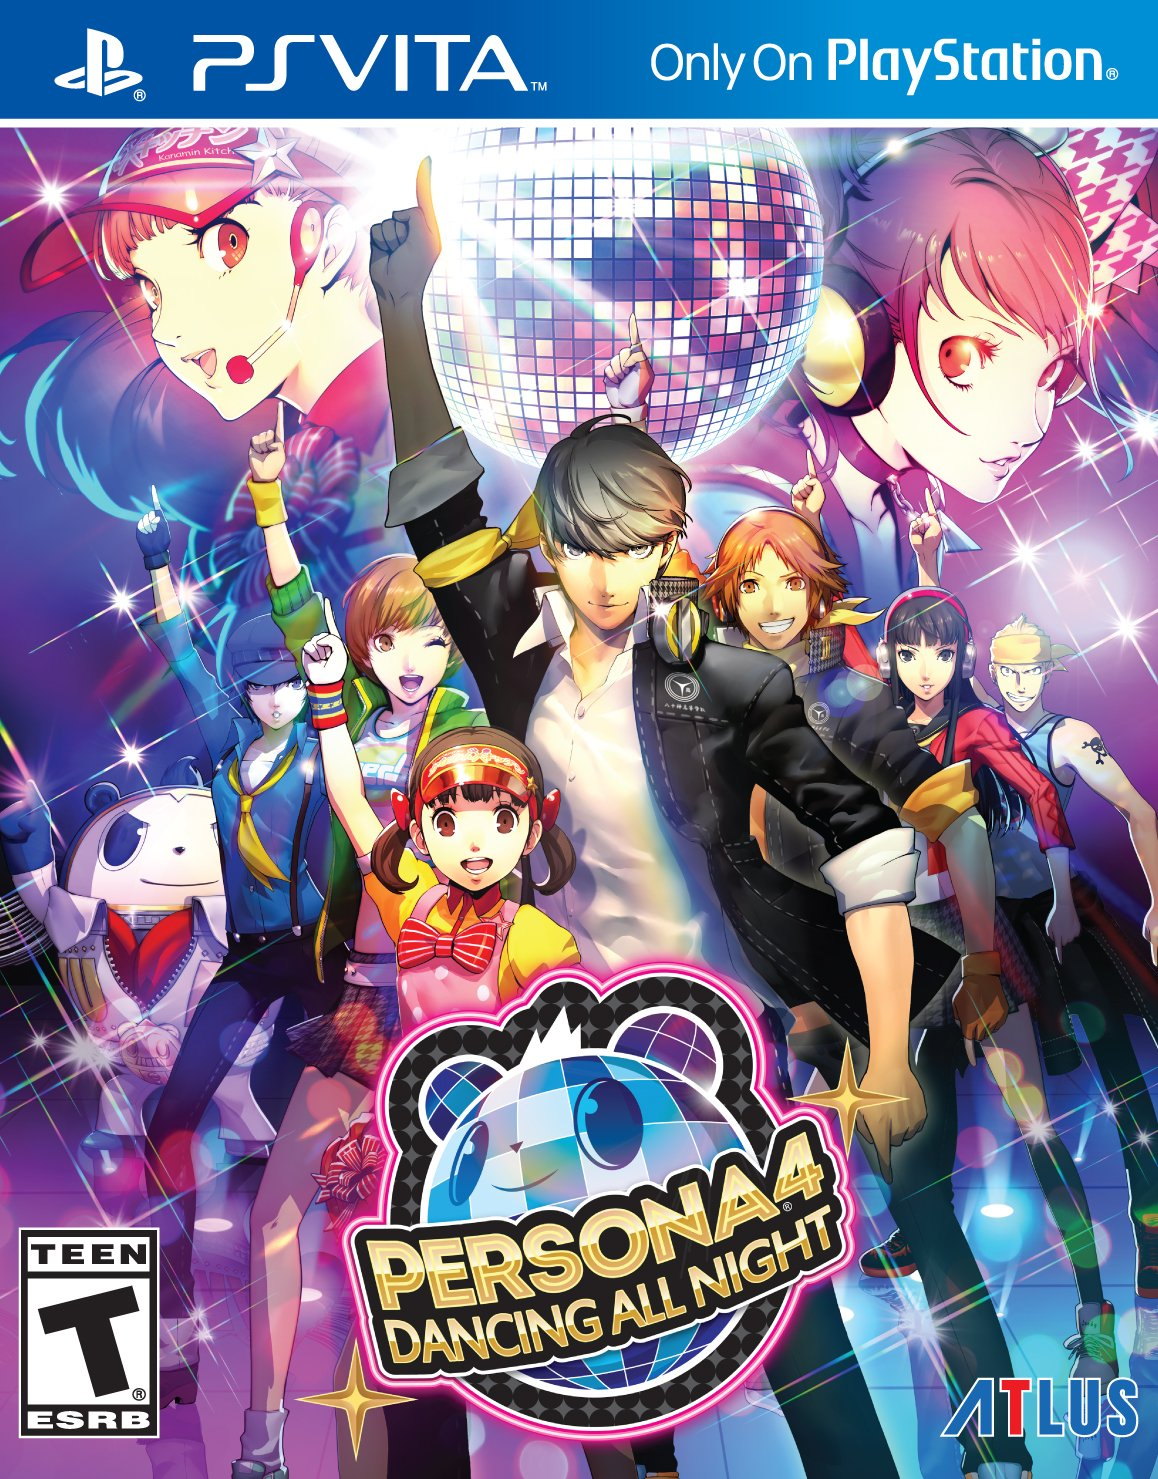 Persona Dancing All Night PlayStation Vita Standard Edition - Japan map persona 4